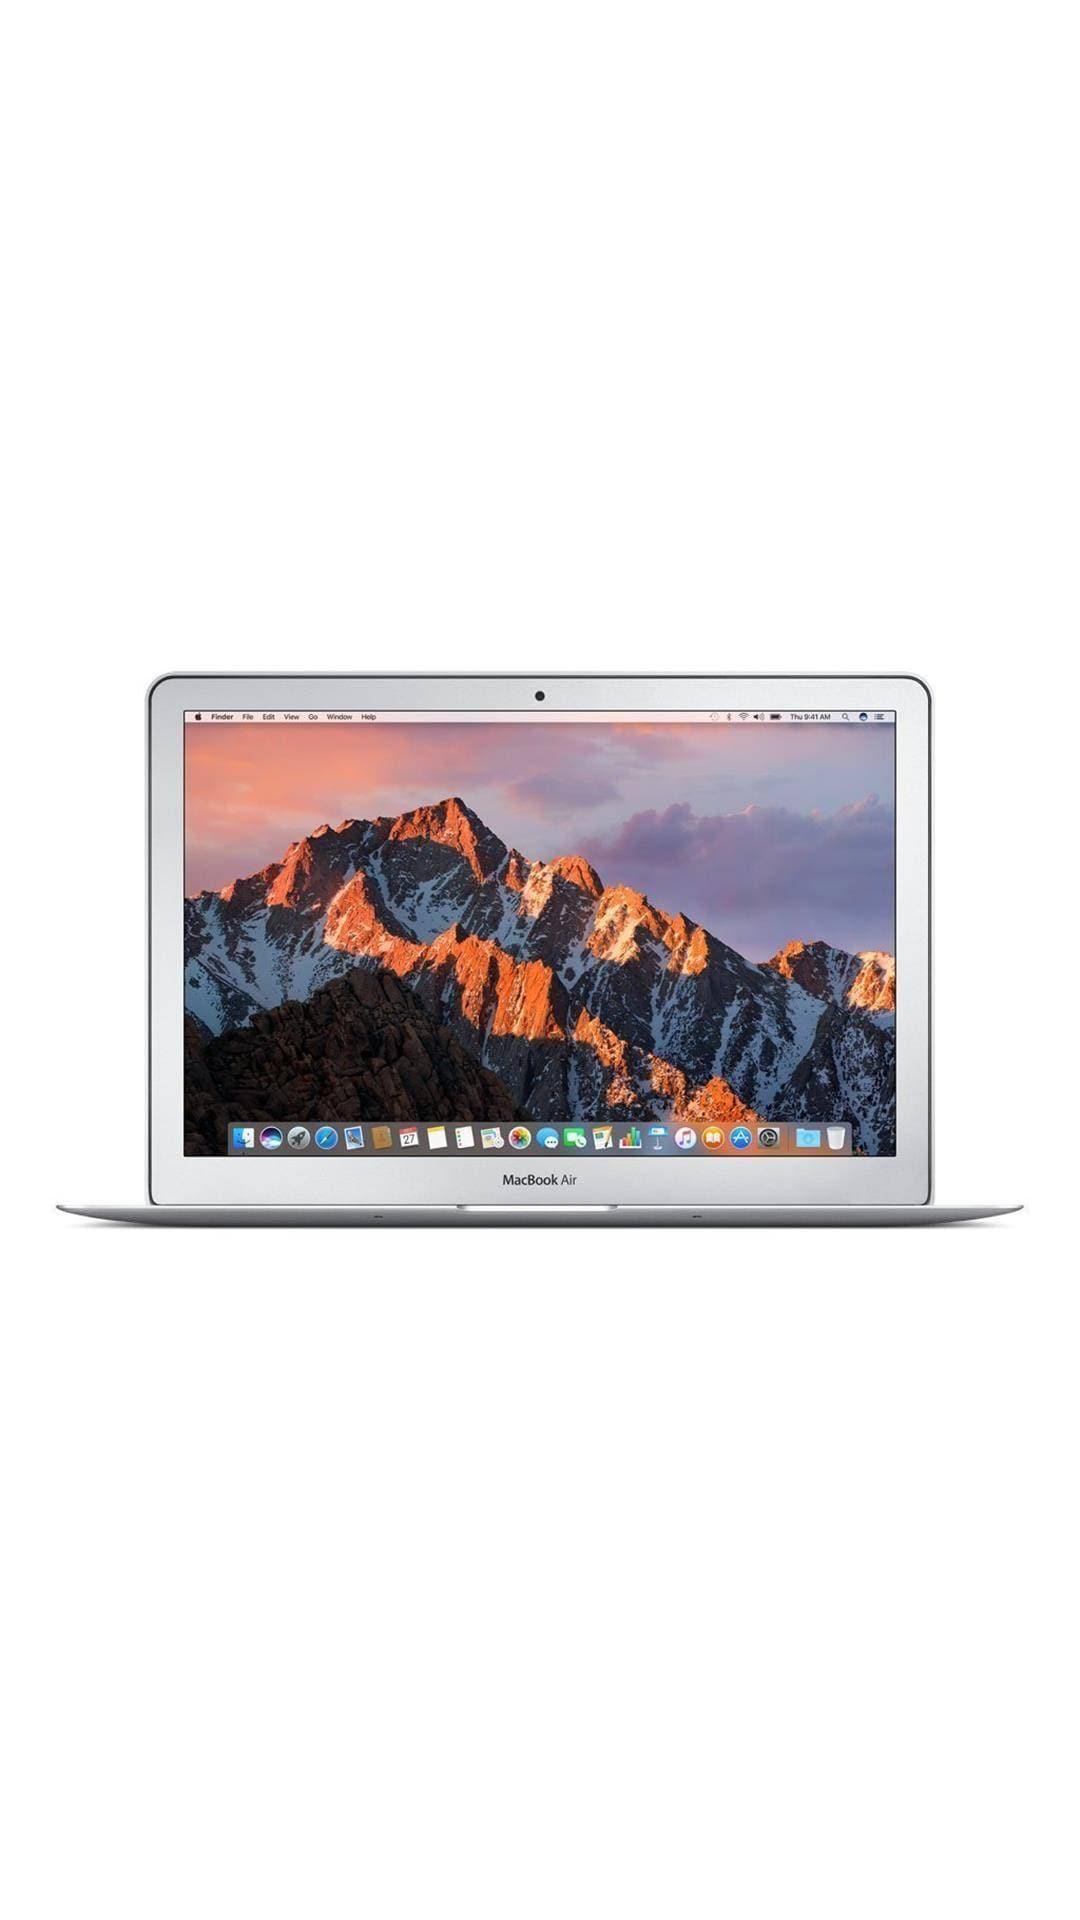 Buy Apple MacBook Air MQD32HN/A Laptop 2017 (Max cashback upto Rs. 15,000) Paytm Mall Rs. 60490